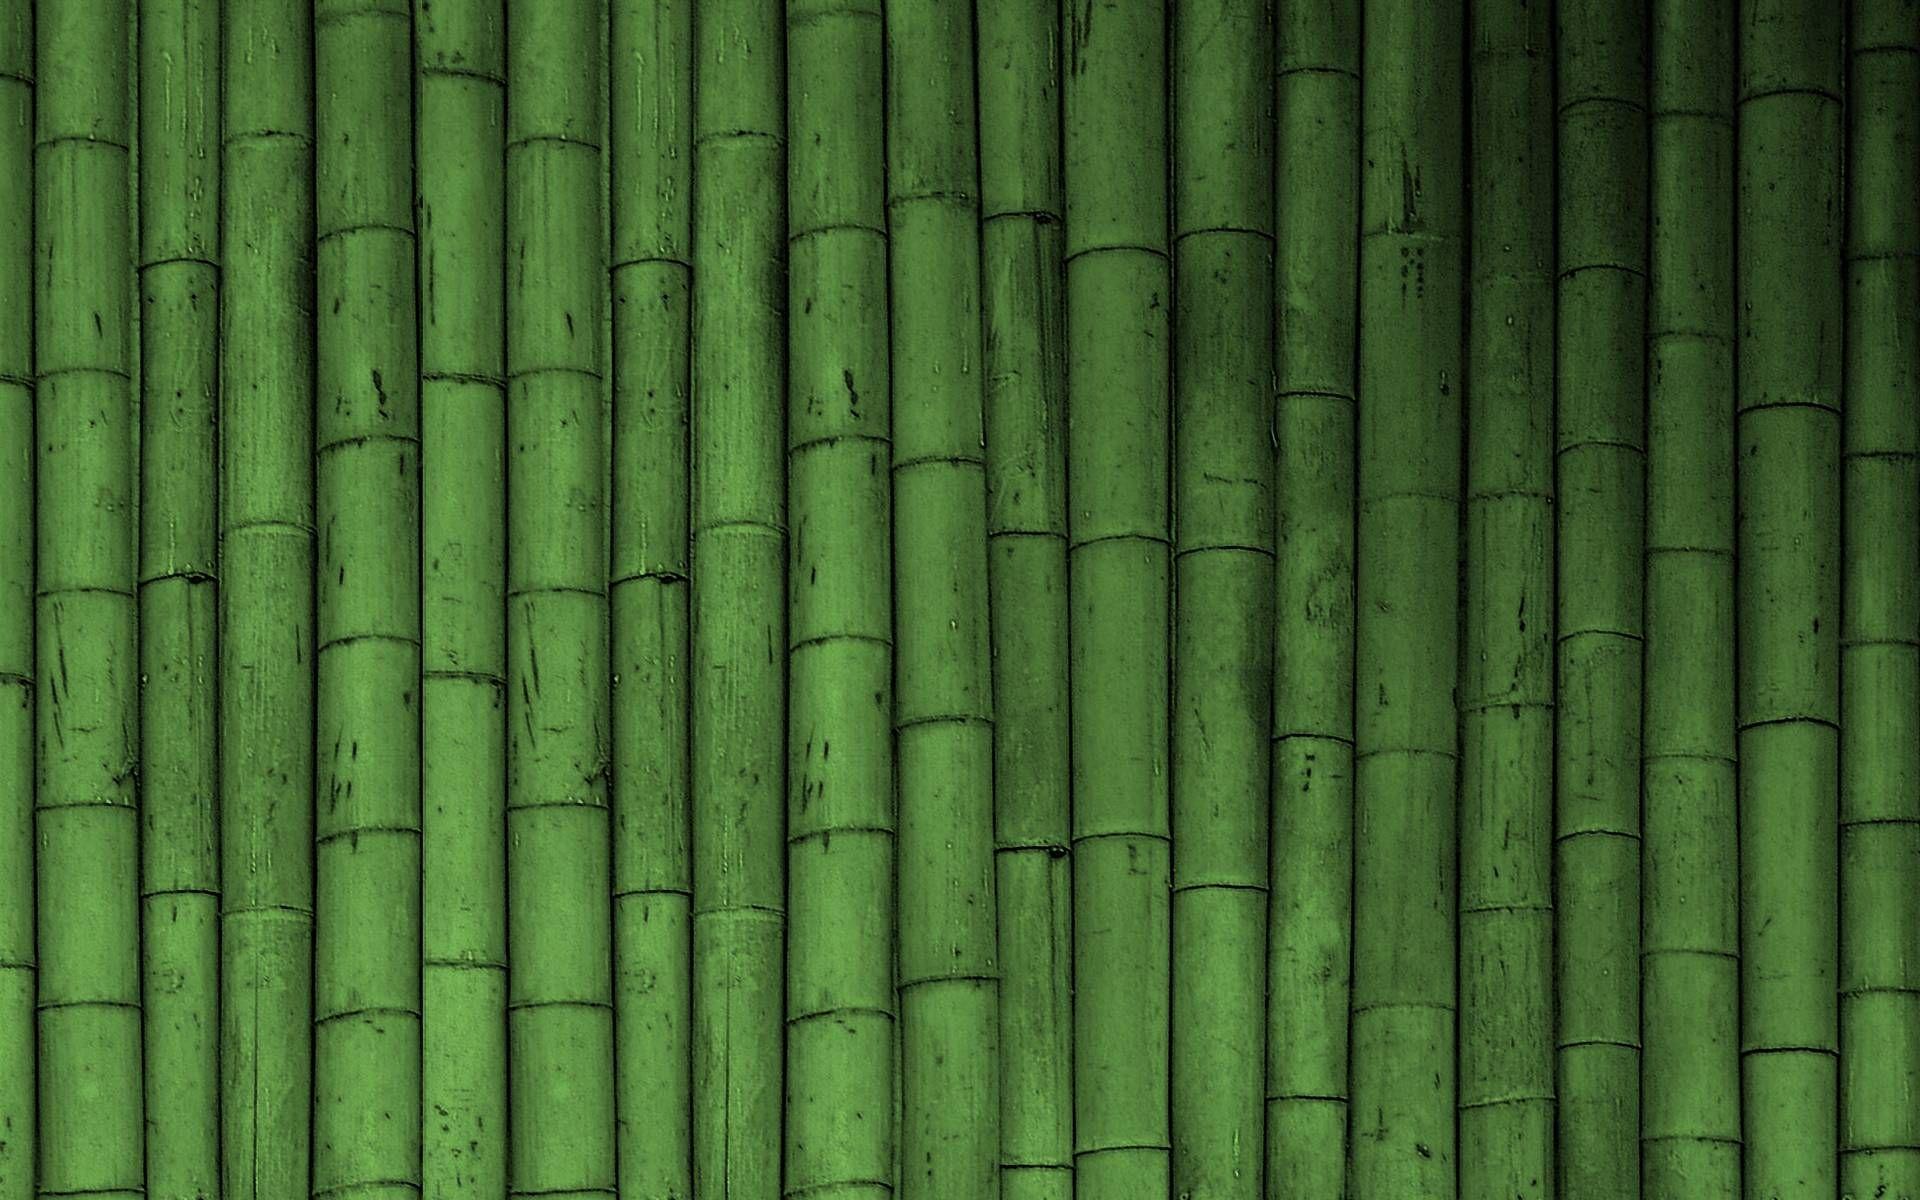 Mobili Bamboo ~ Bamboo desktop wallpapers wallpaper wallpapers pinterest